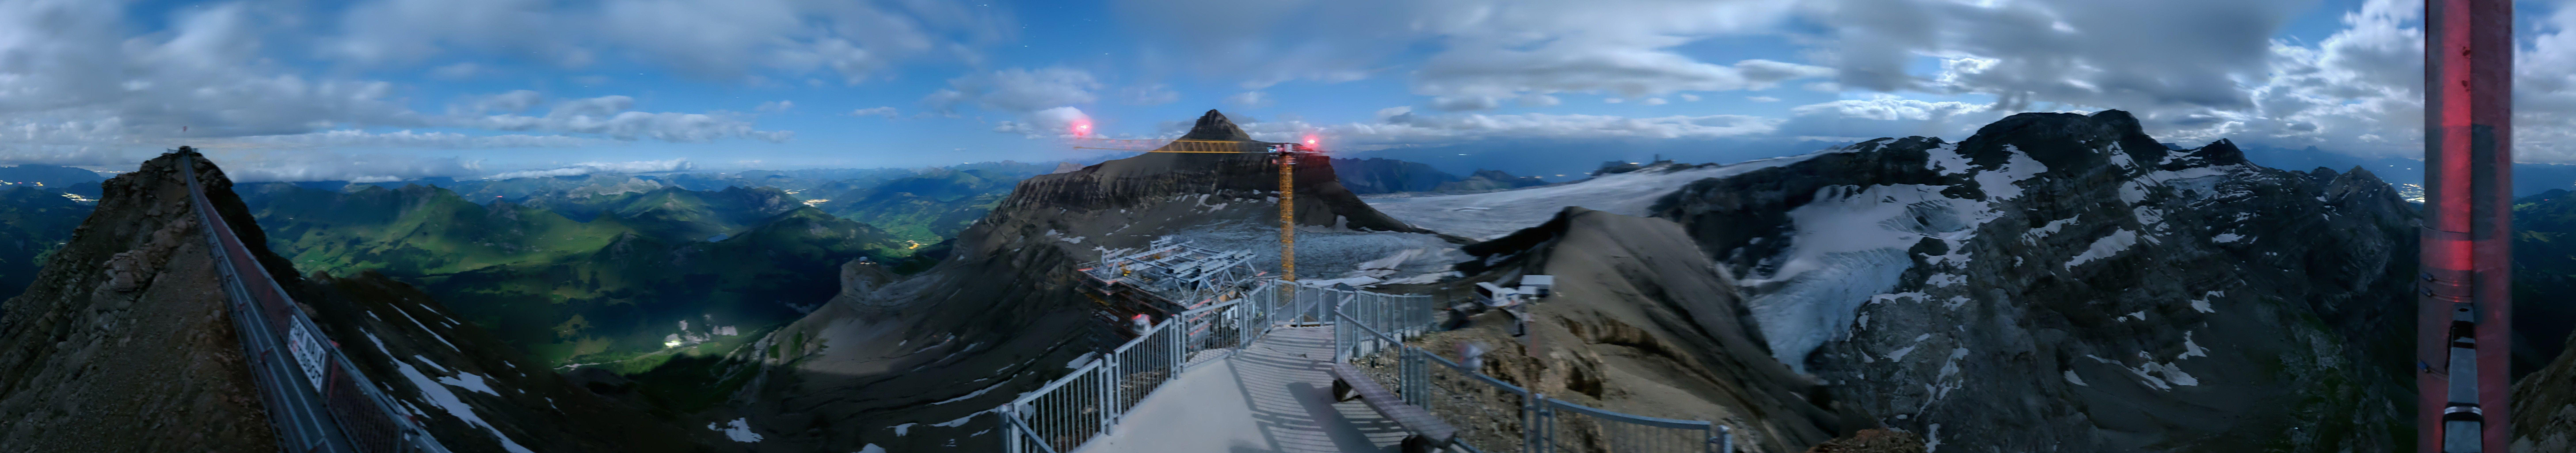 Ormont-Dessus: Scex Rouge - Oldenhorn - Diablerets - Glacier 3000